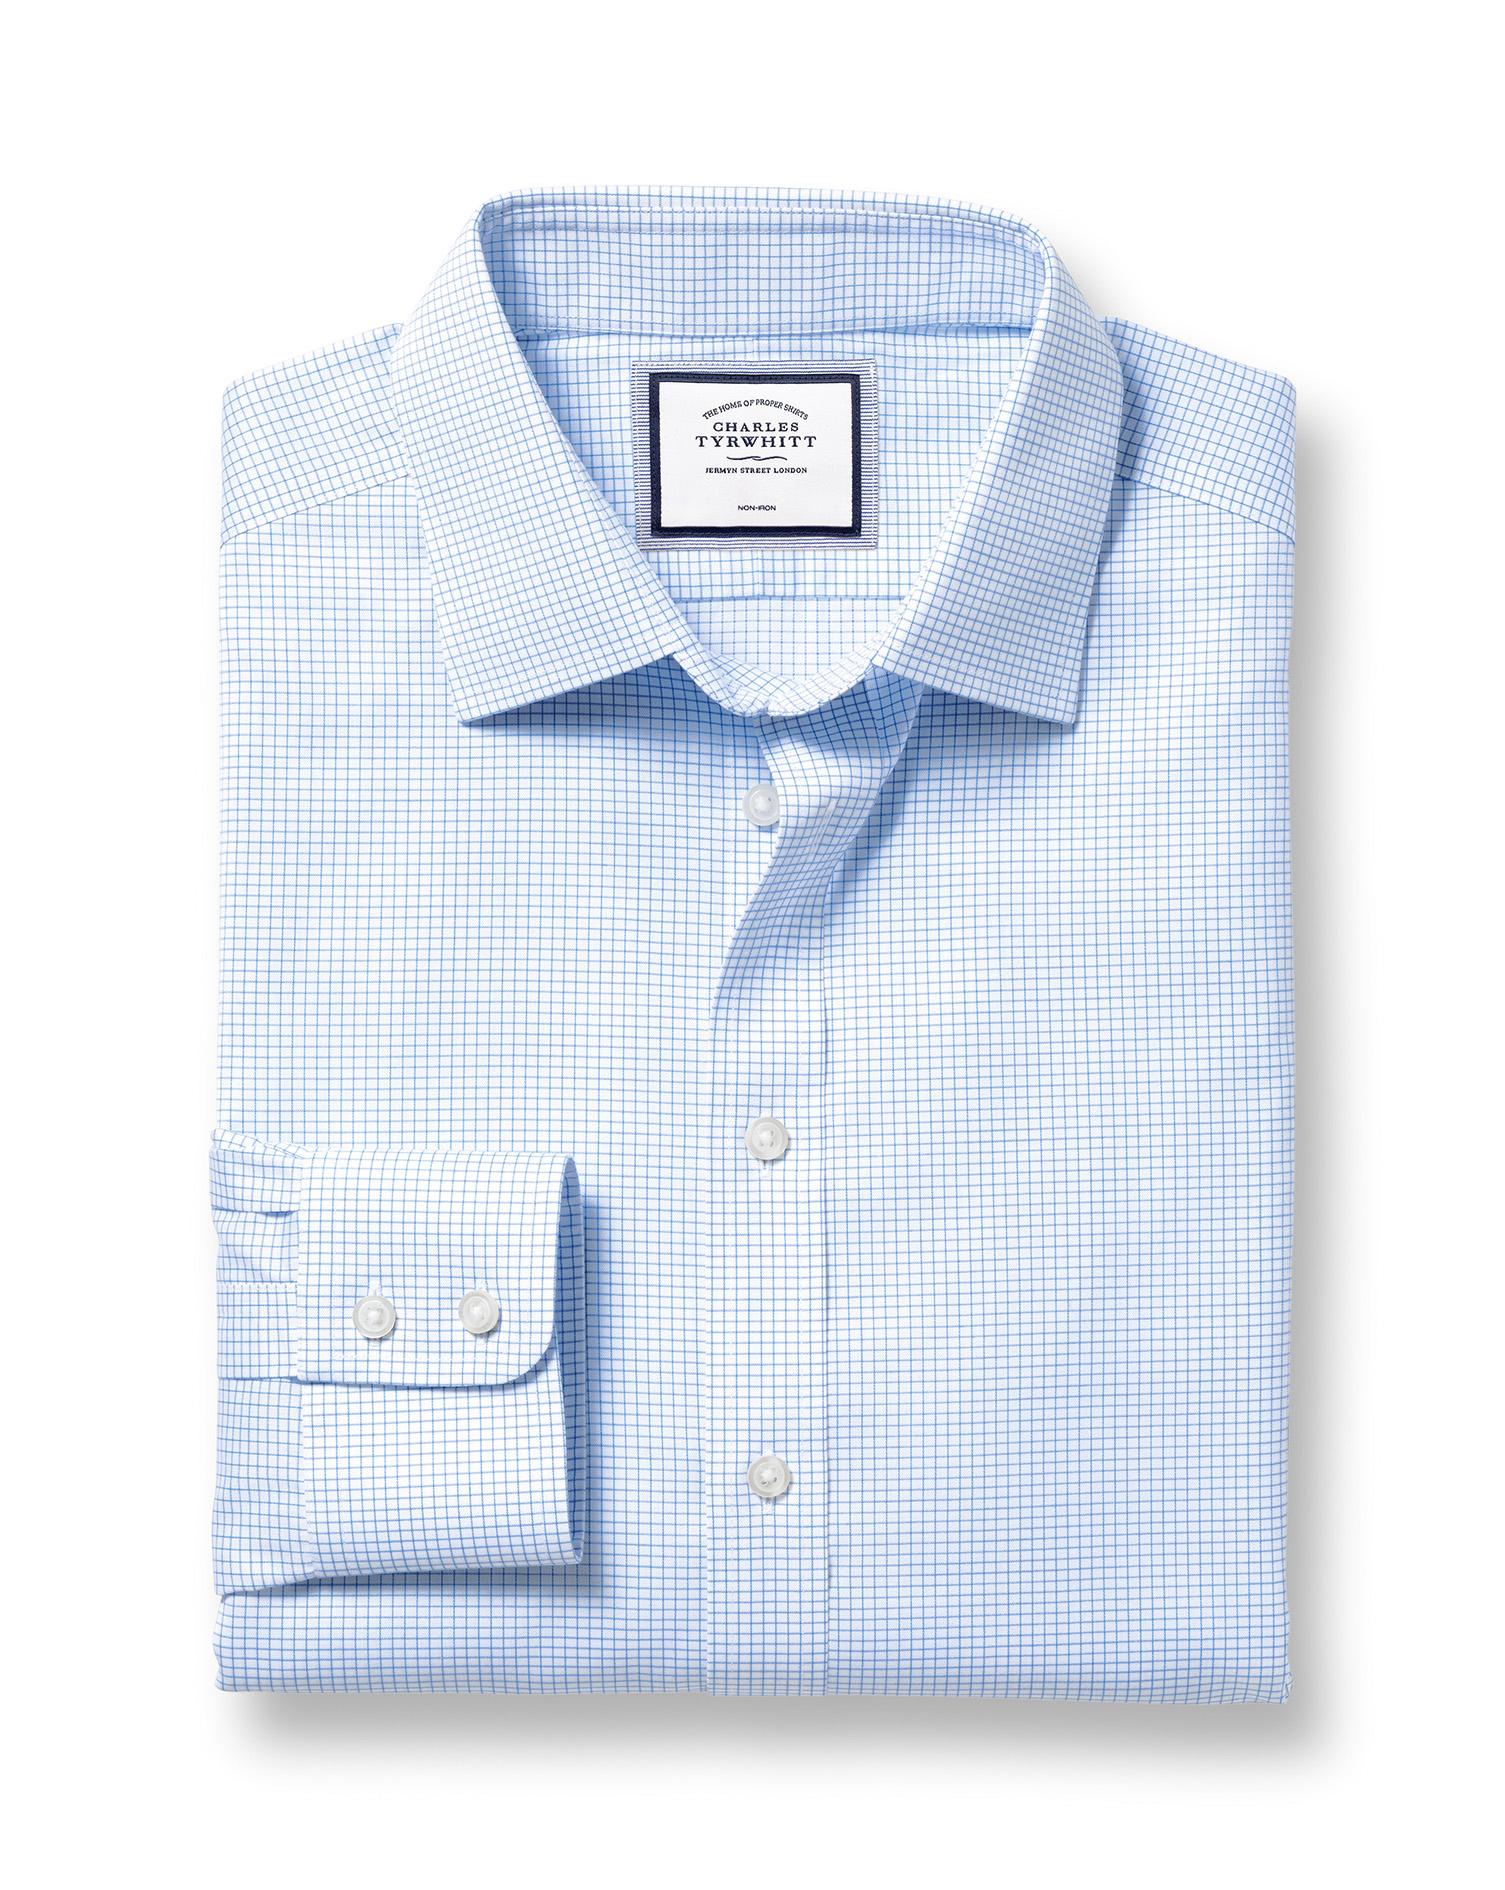 Classic Fit Non-Iron Sky Blue Mini Grid Check Twill Cotton Formal Shirt by Charles Tyrwhitt